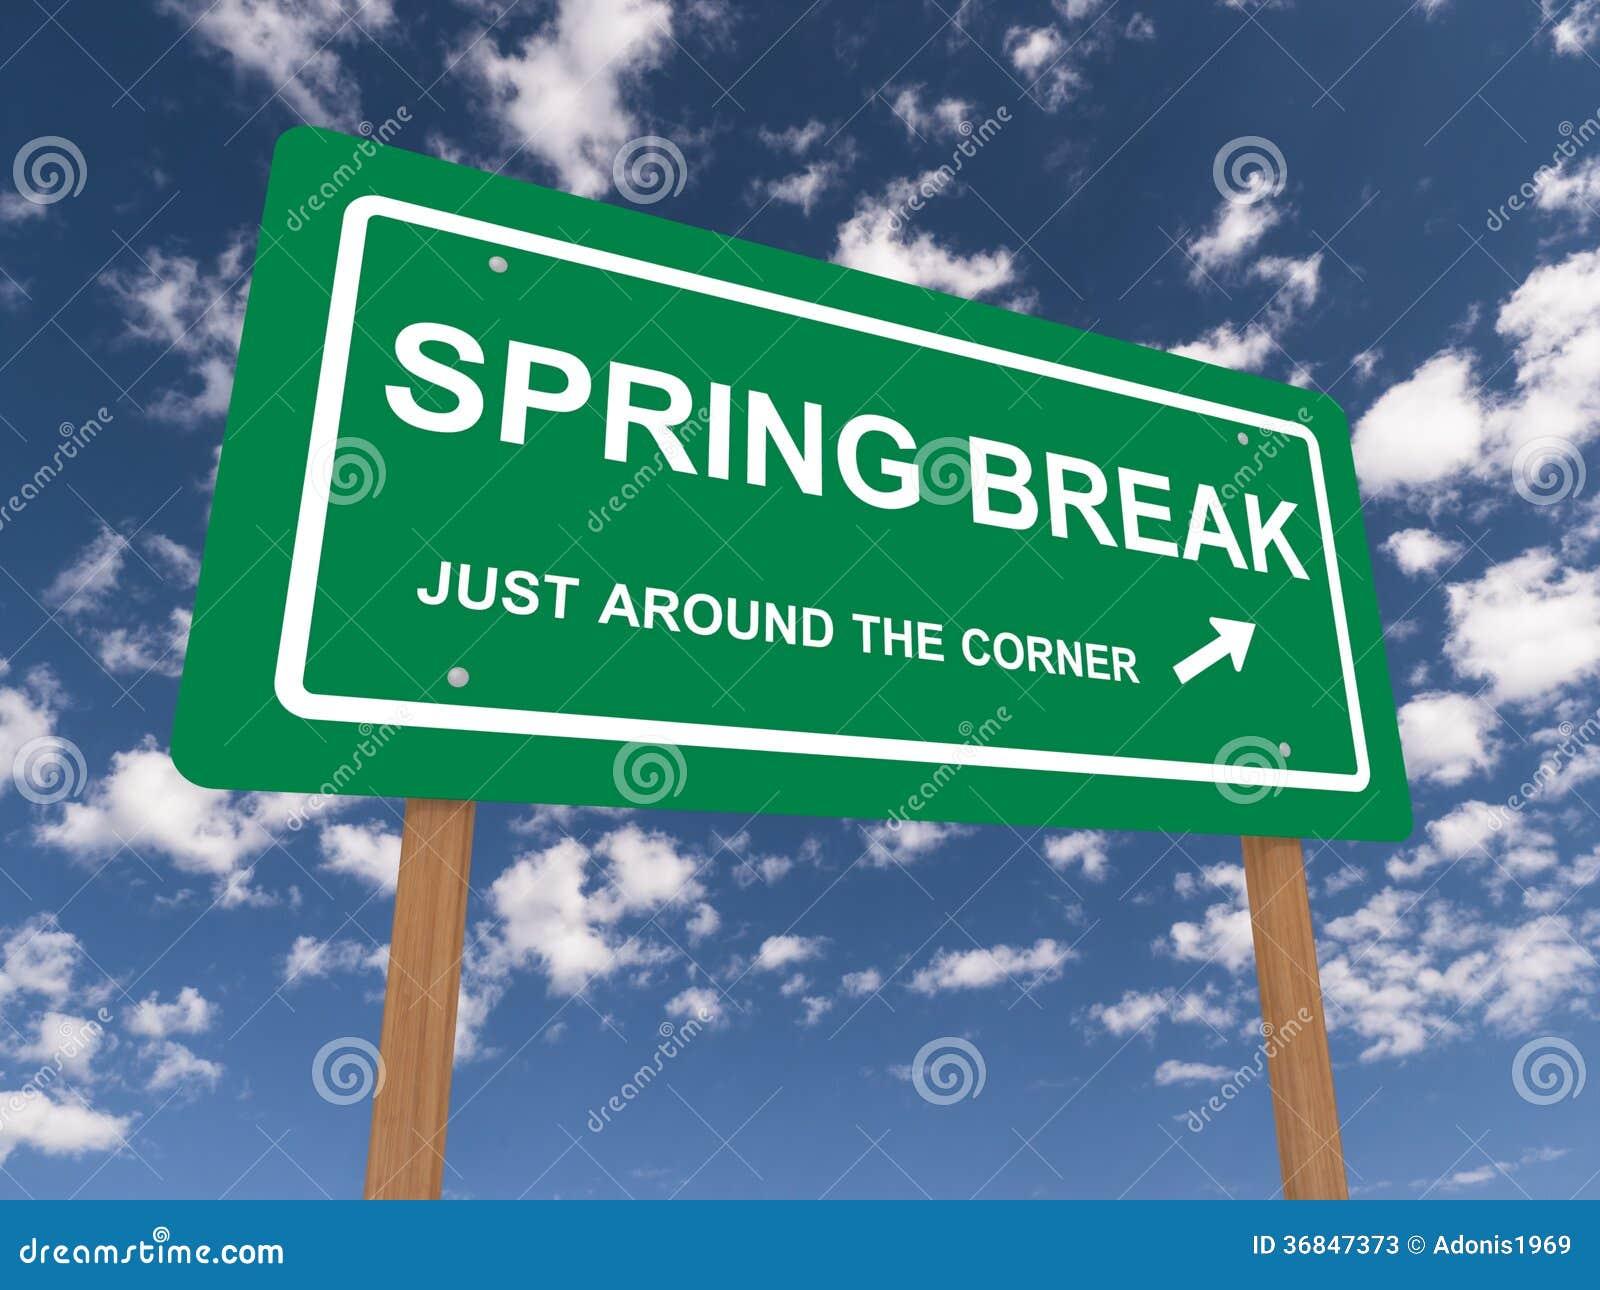 Spring break sign